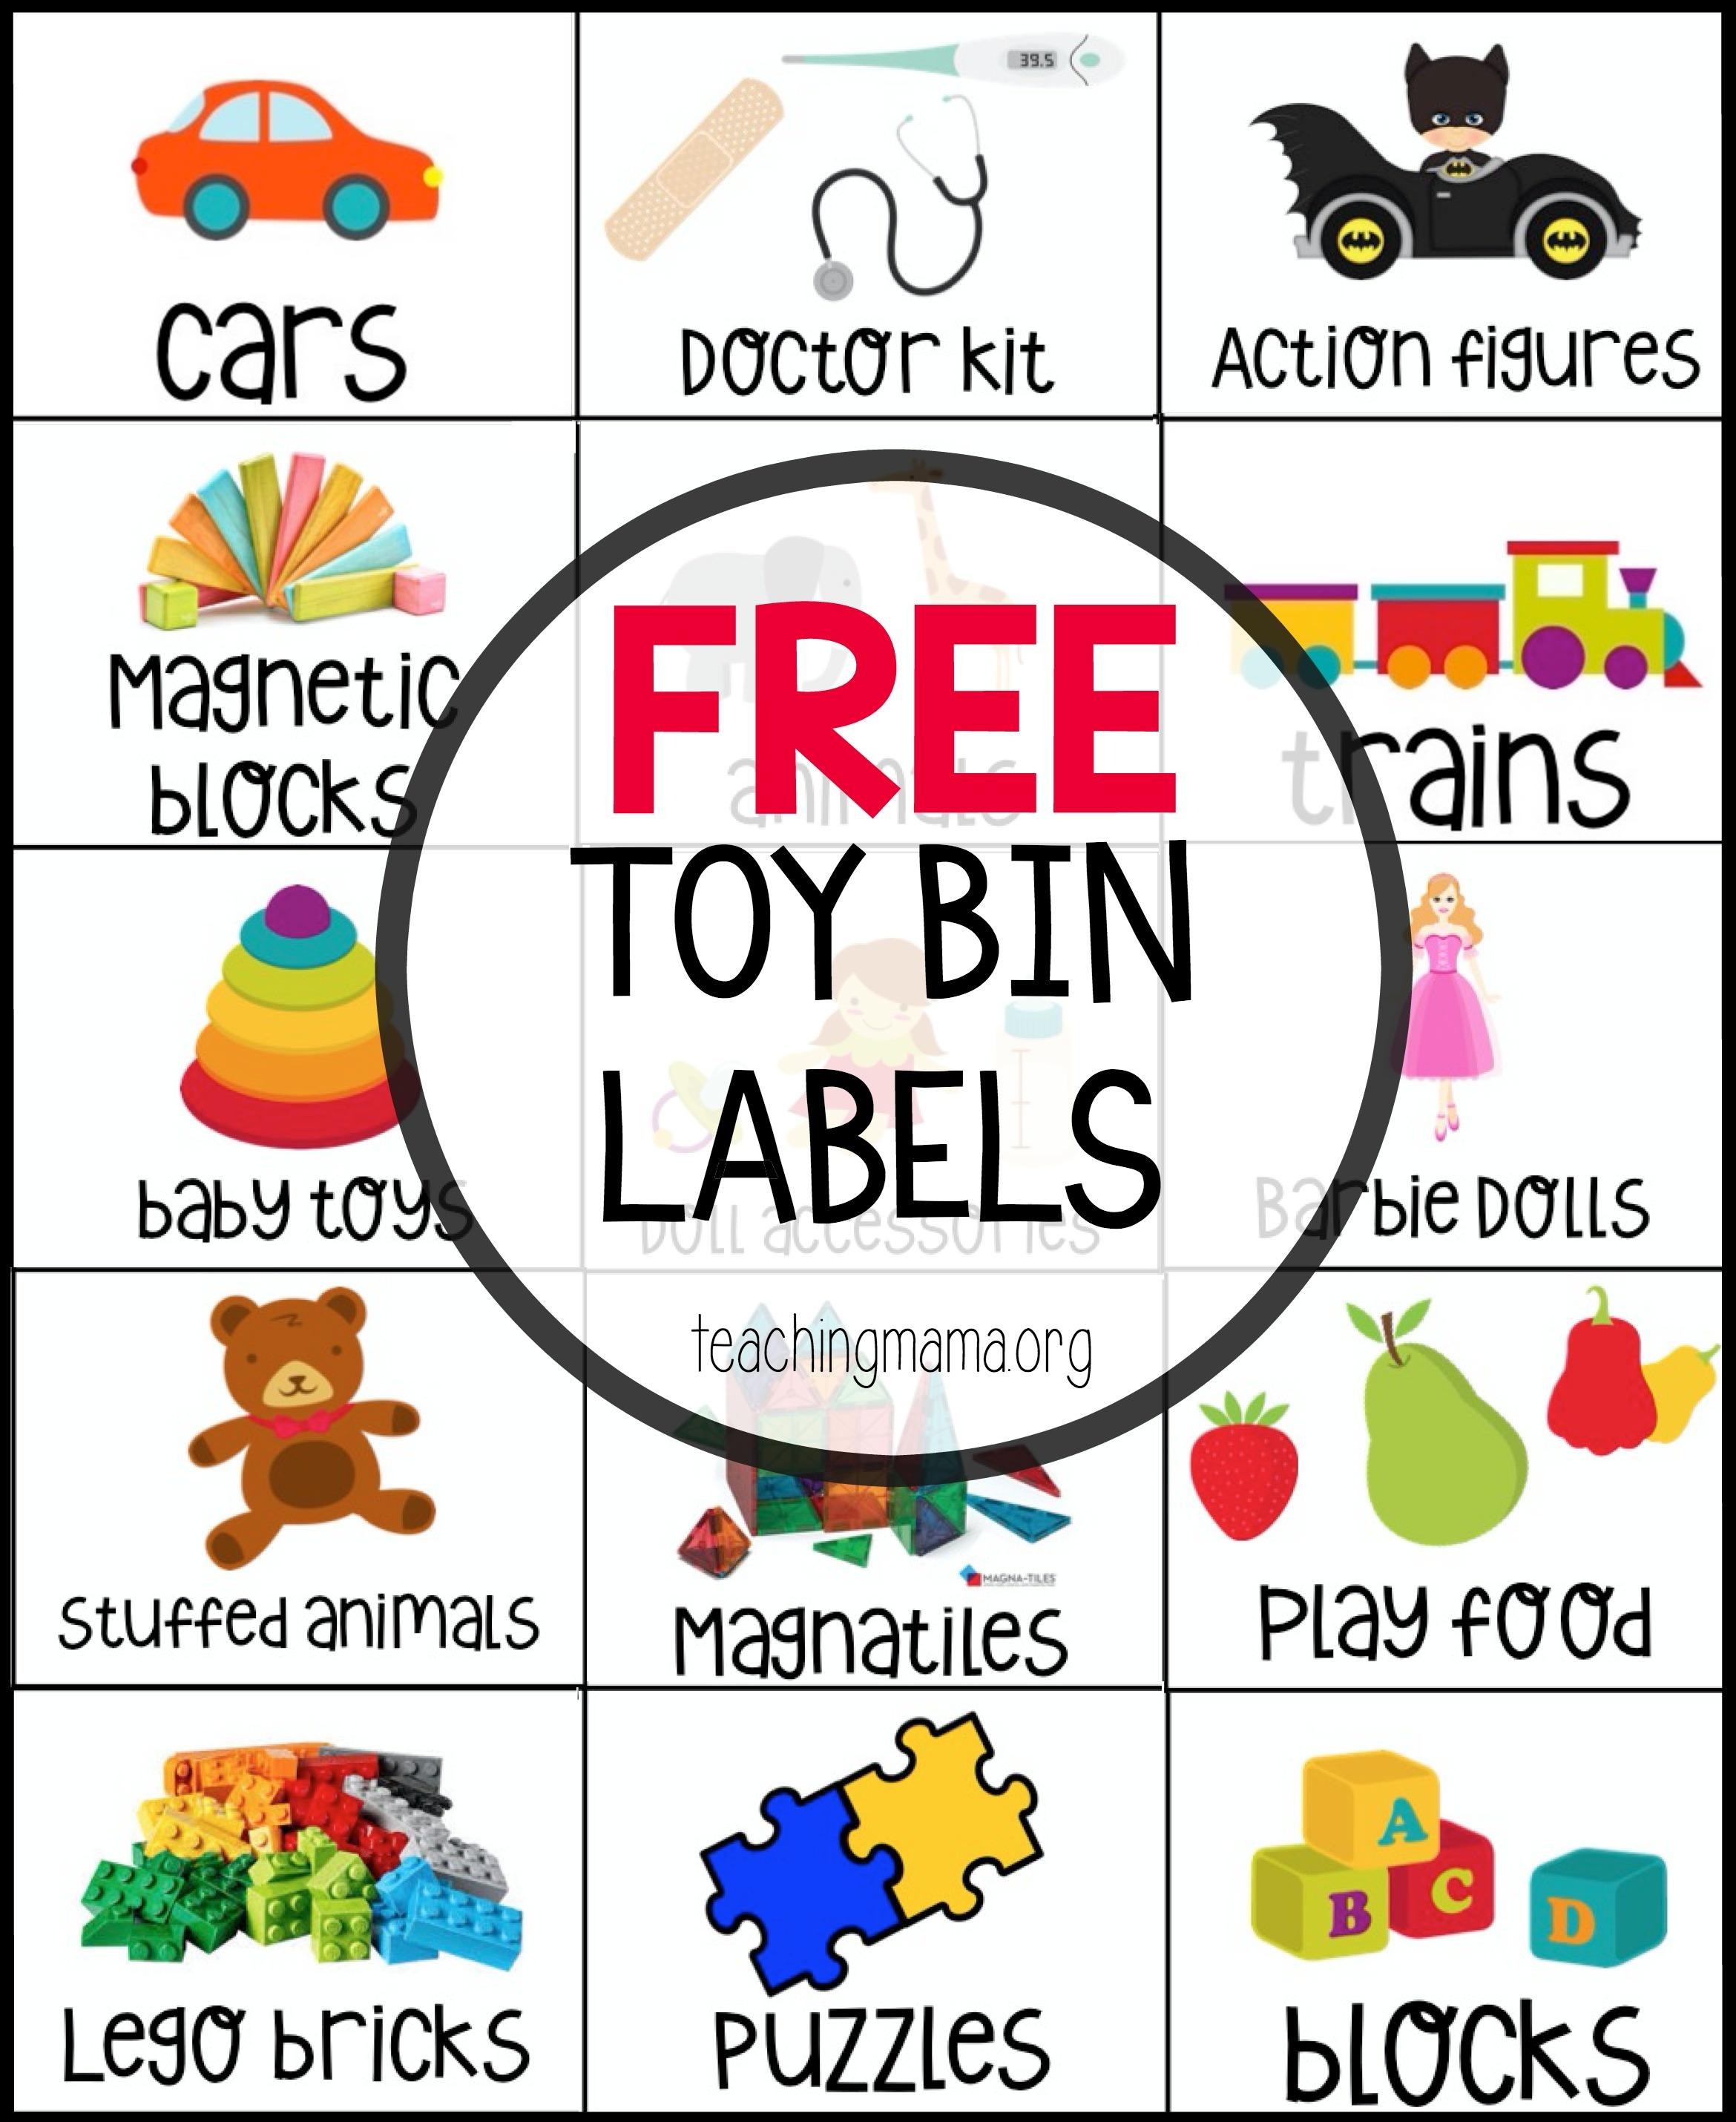 Free Toy Bin Labels - Free Printable Labels For Storage Bins